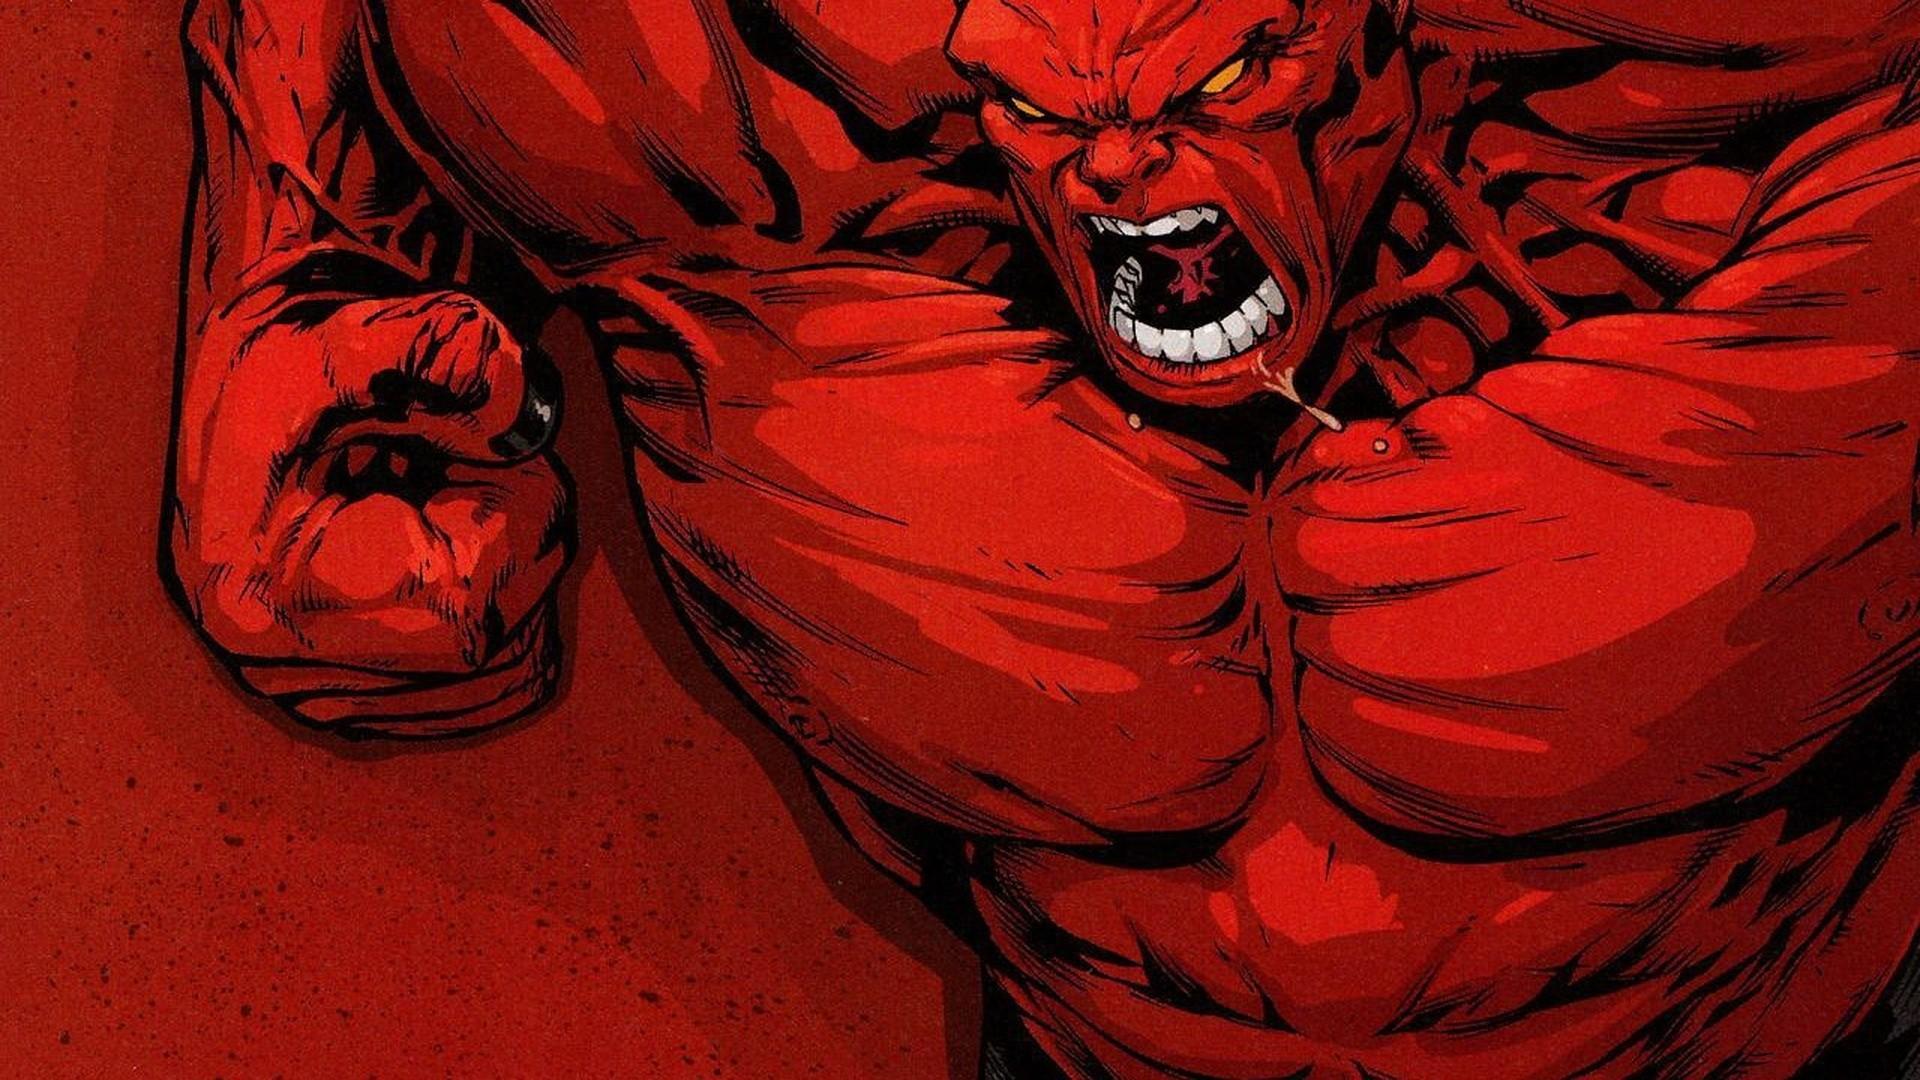 Res: 1920x1080, Red Hulk vs Green Hulk HD desktop wallpaper : High Definition .